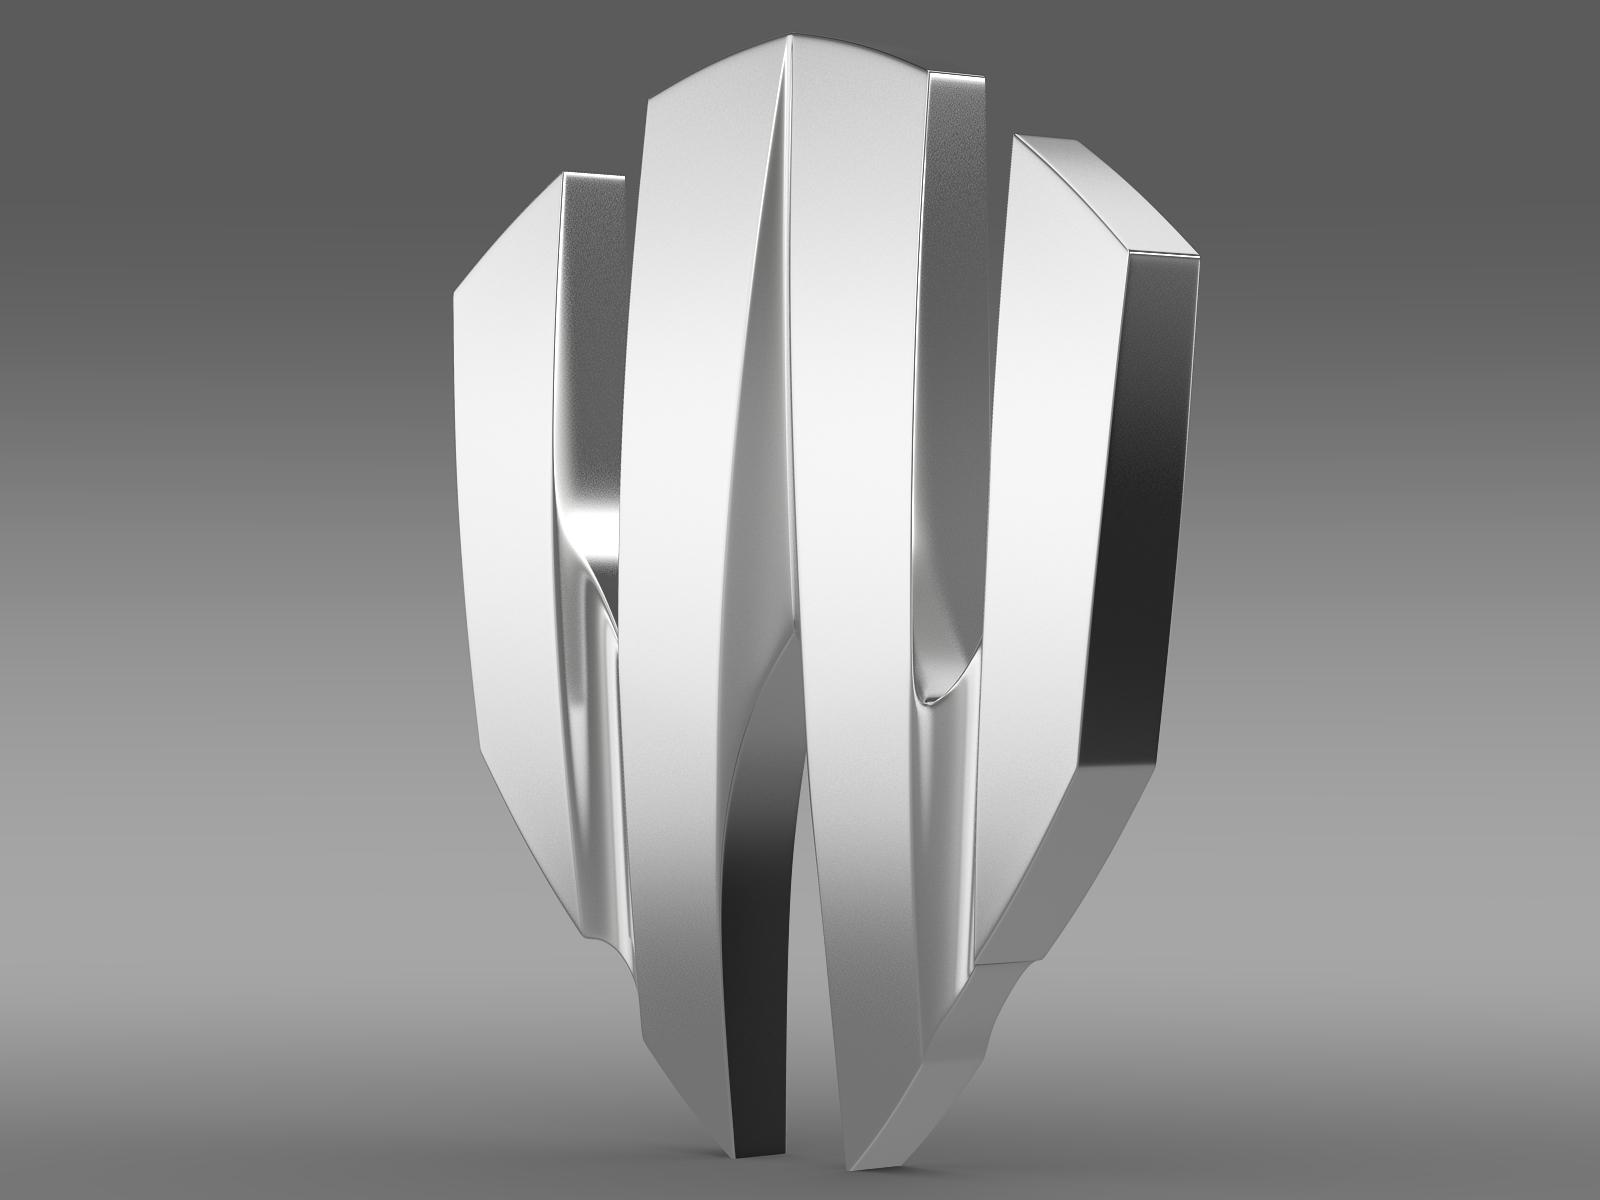 w motors lykan hypersport logo 3d modelis 3ds max fbx c4d lwo ma mb hrc xsi obj 213242